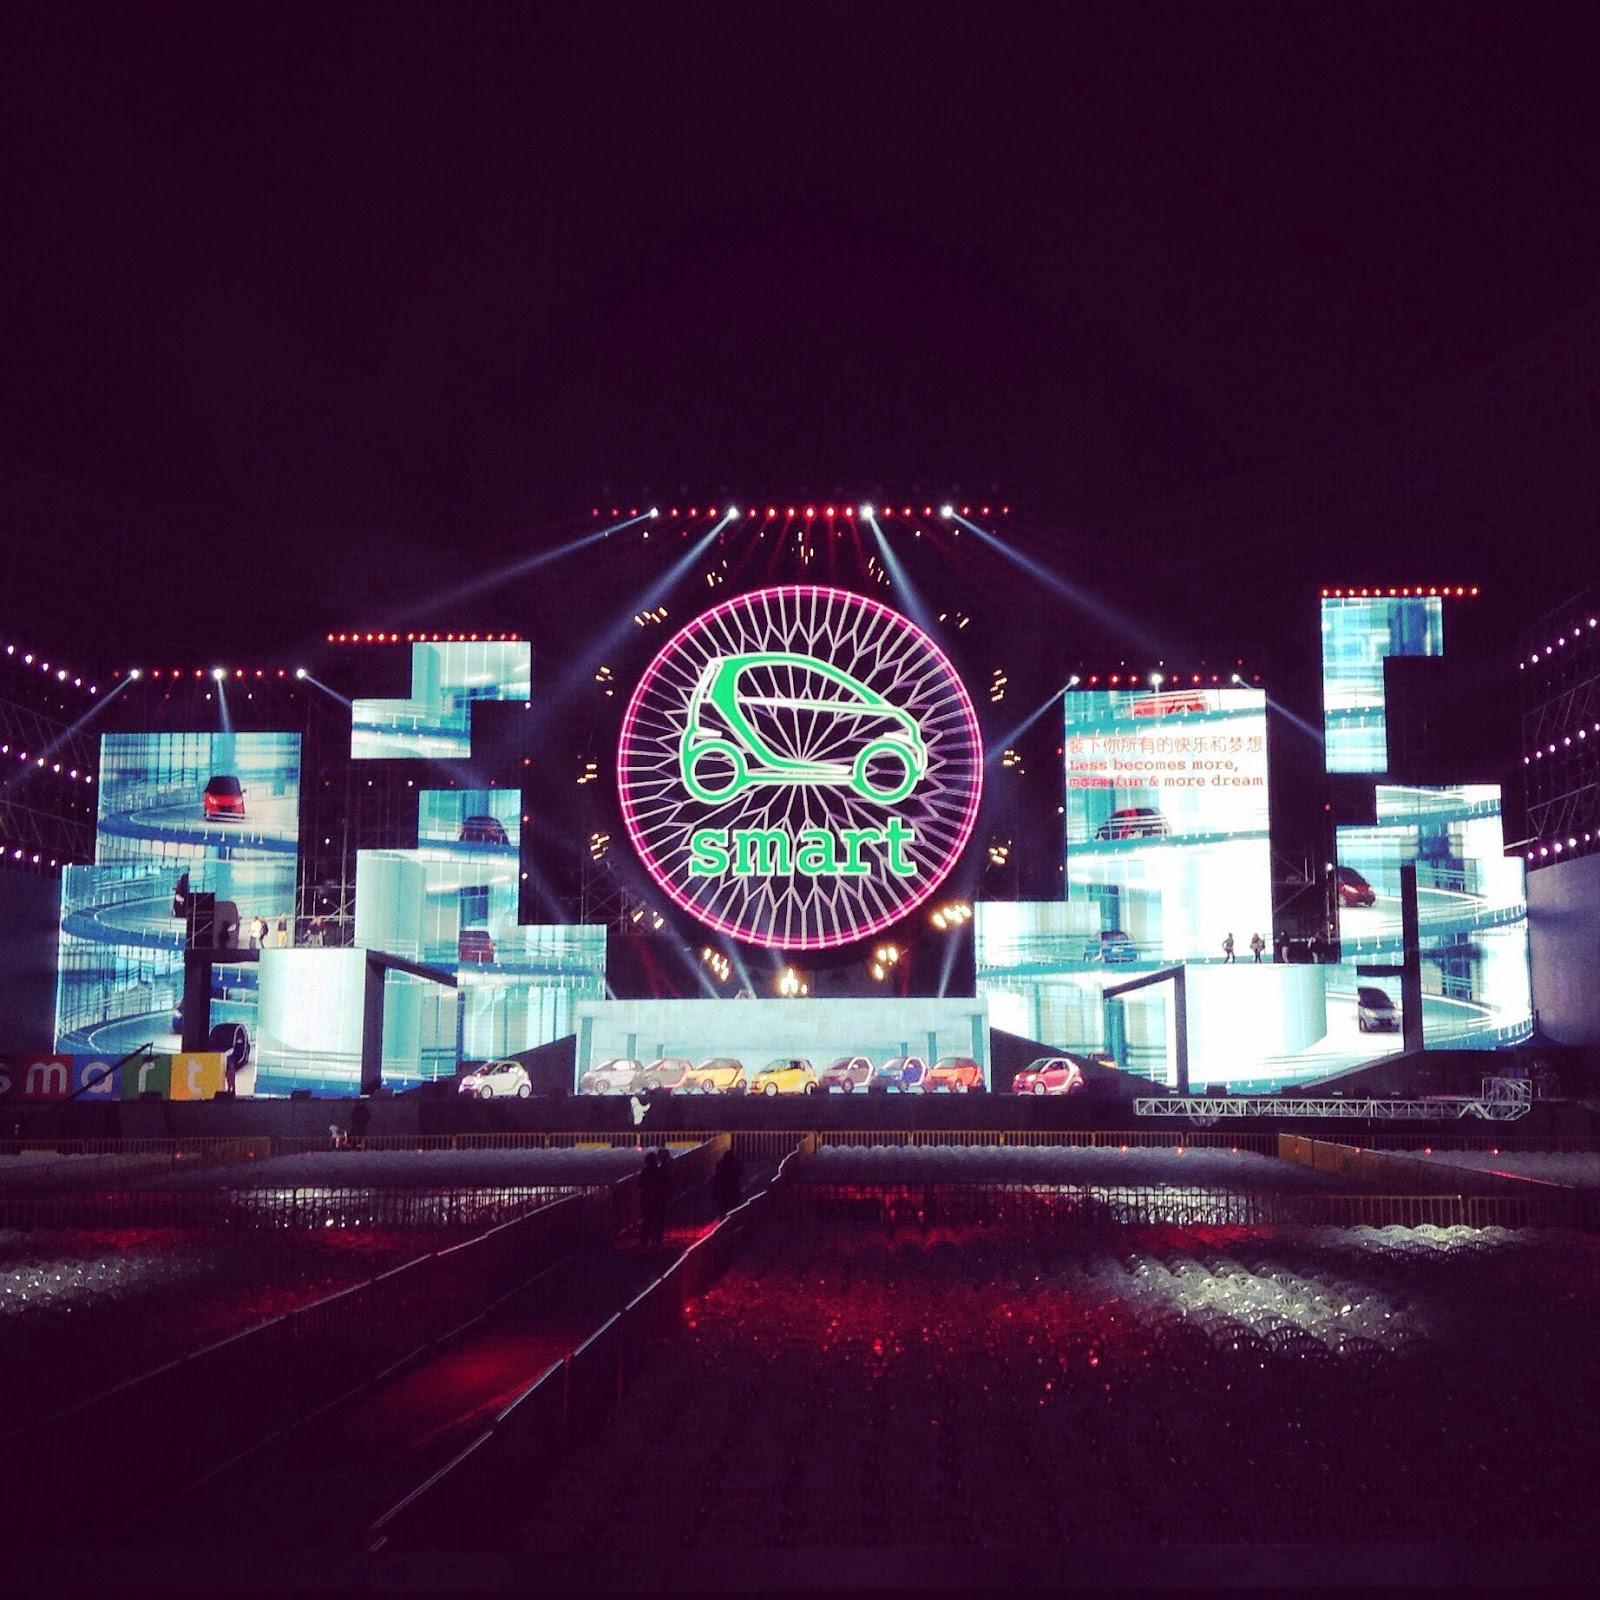 Rain 本日上海にてSmart China 5th Anniversary コンサート_c0047605_15404285.jpg